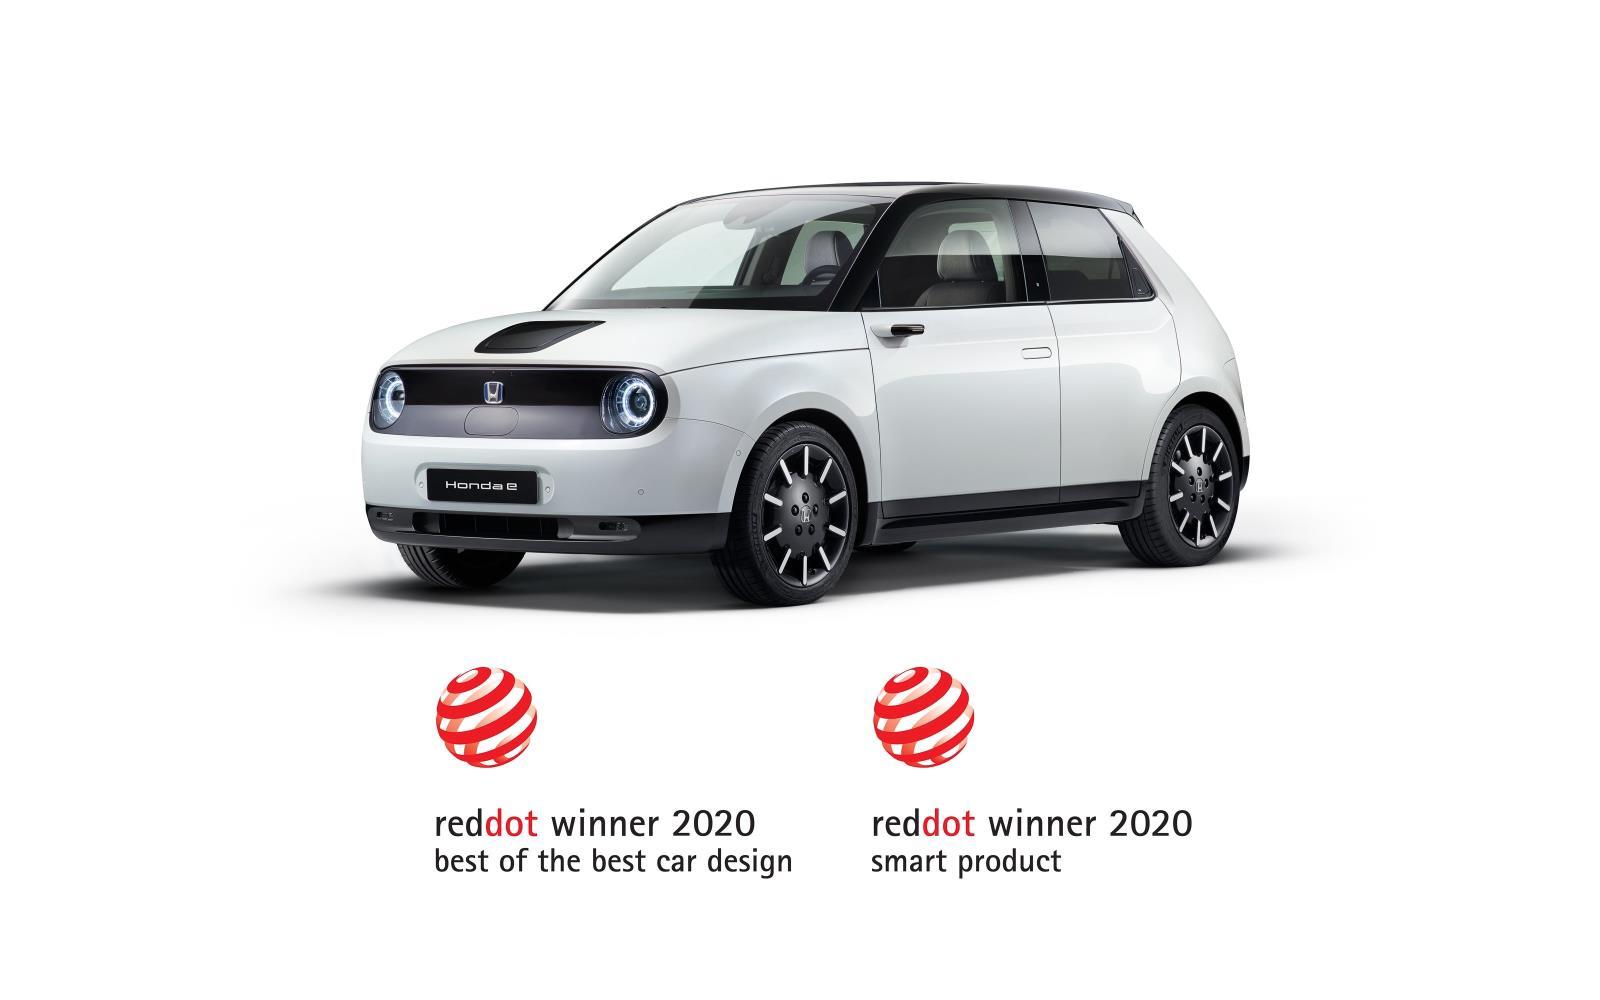 202528-HONDA-WINS-THREE-RED-DOT-DESIGN-AWARDS-INCLUDING-BEST-OF-THE-BEST-FOR-HONDA